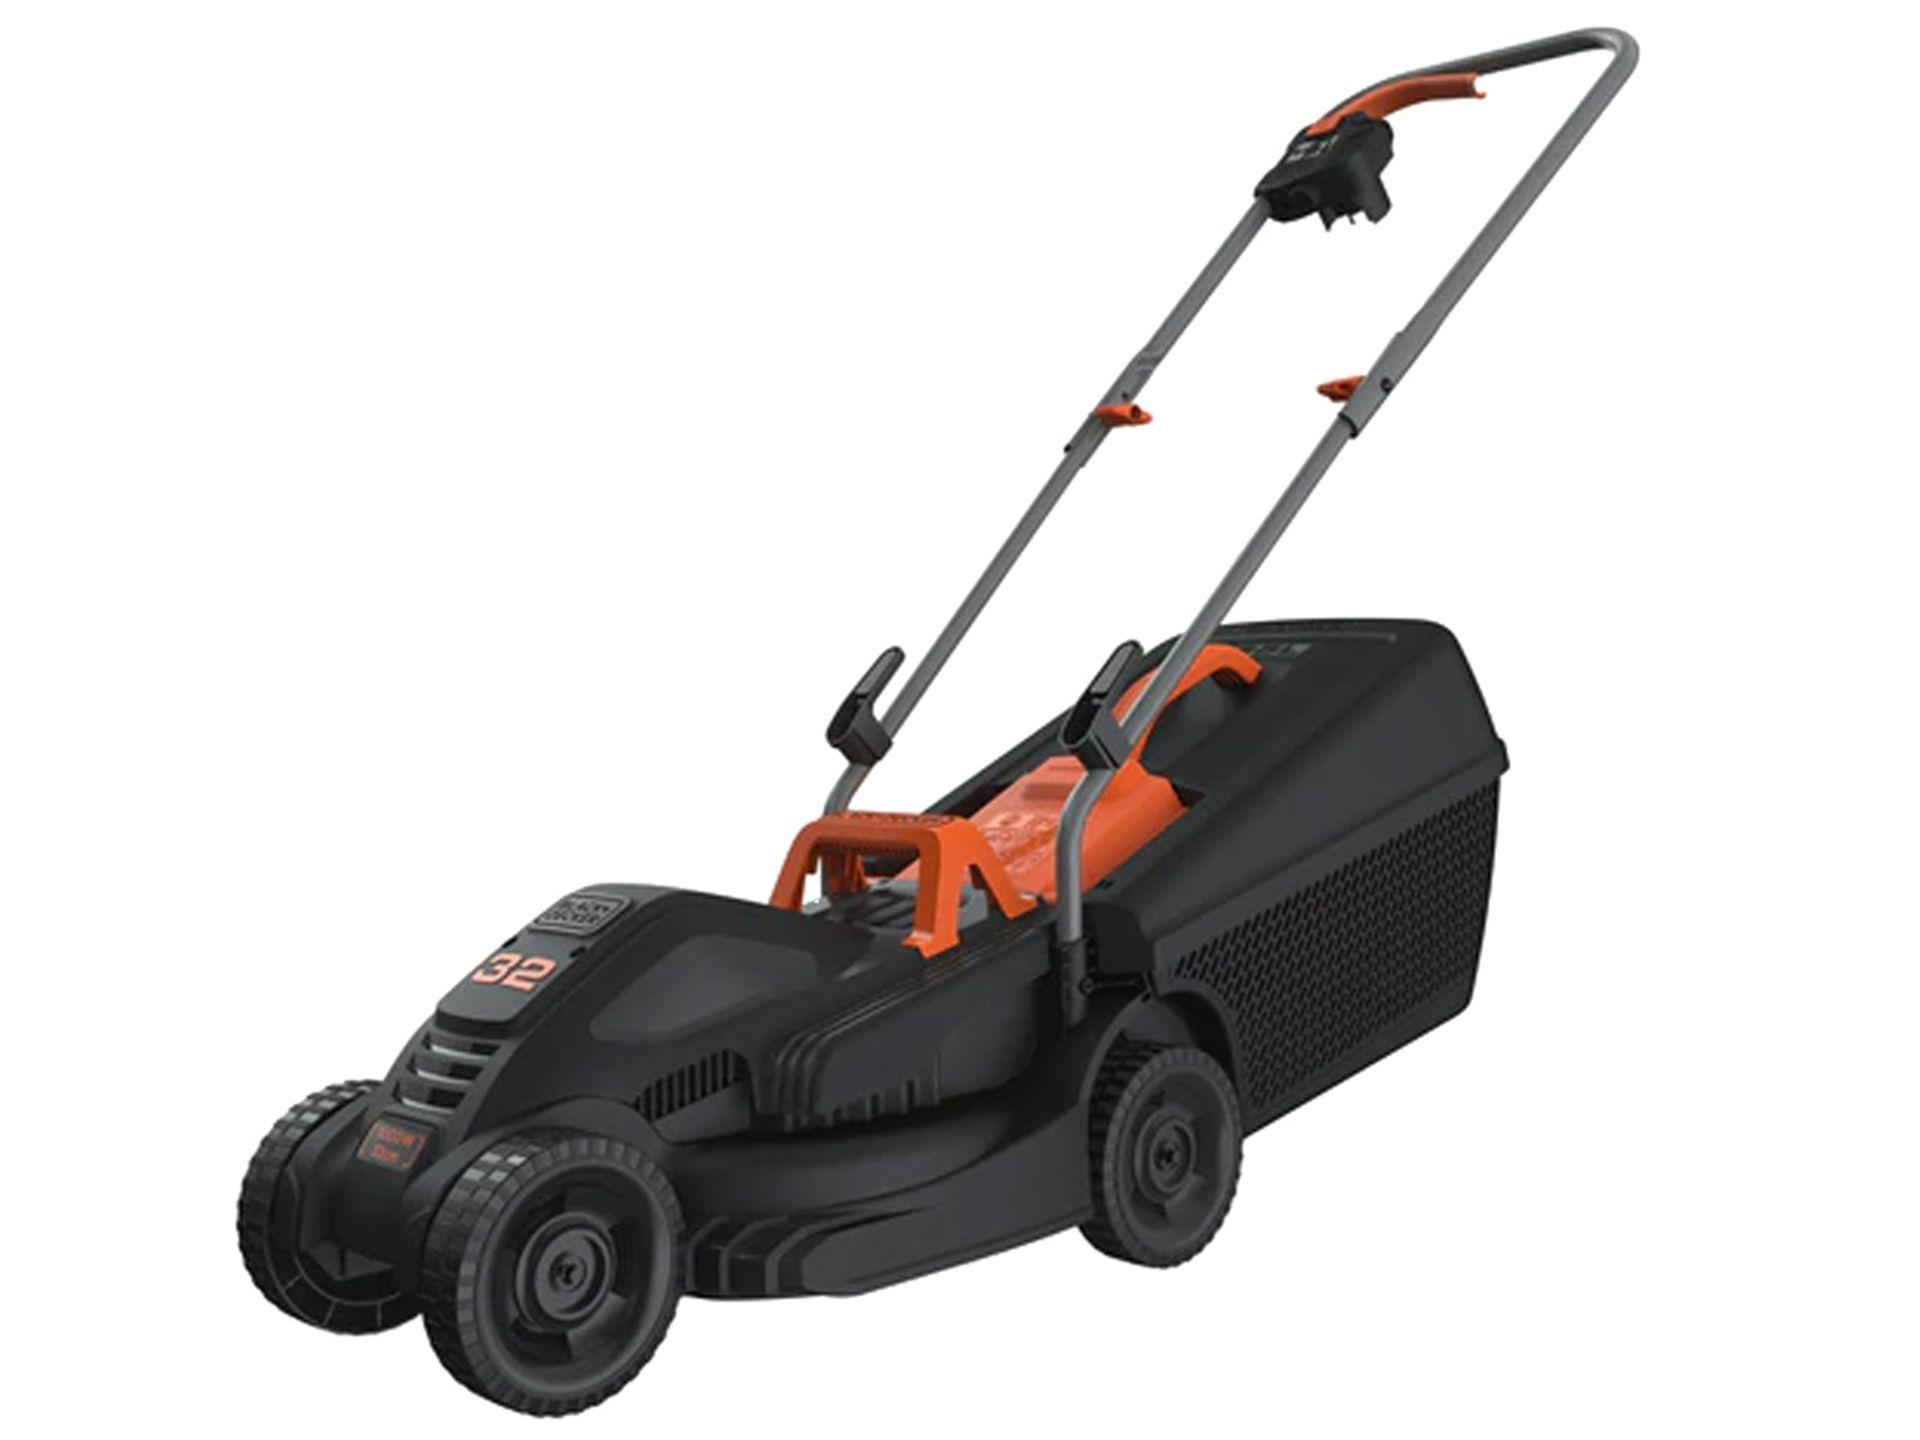 (P2) 1x Black & Decker 32cm 1000W Corded Lawn Mower & Strimmer RRP £99. Contents Appear Clean, Unu - Image 2 of 5